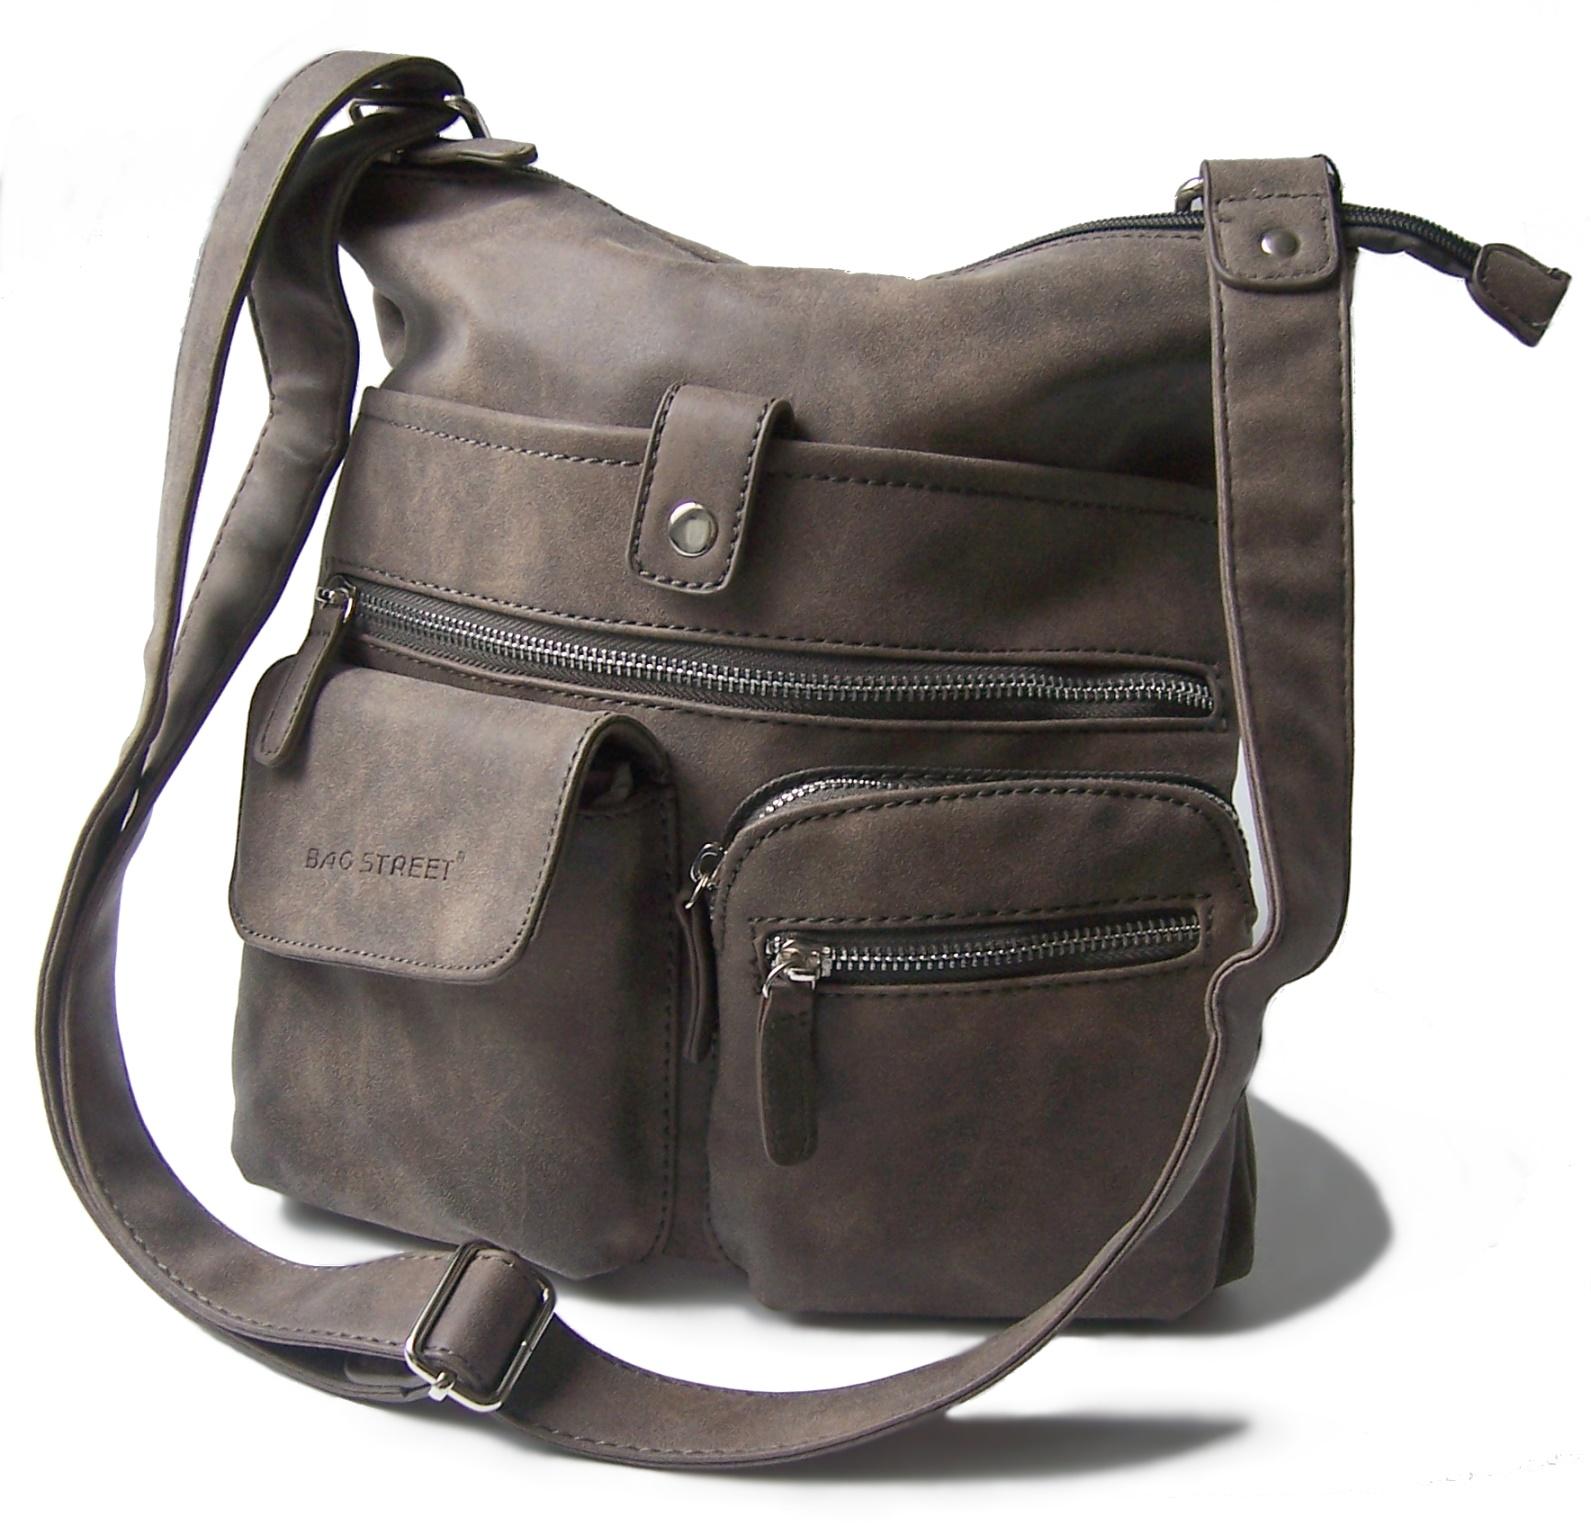 Tasche Handtasche Schultertasche Bag Street taupe Damen Ta6029